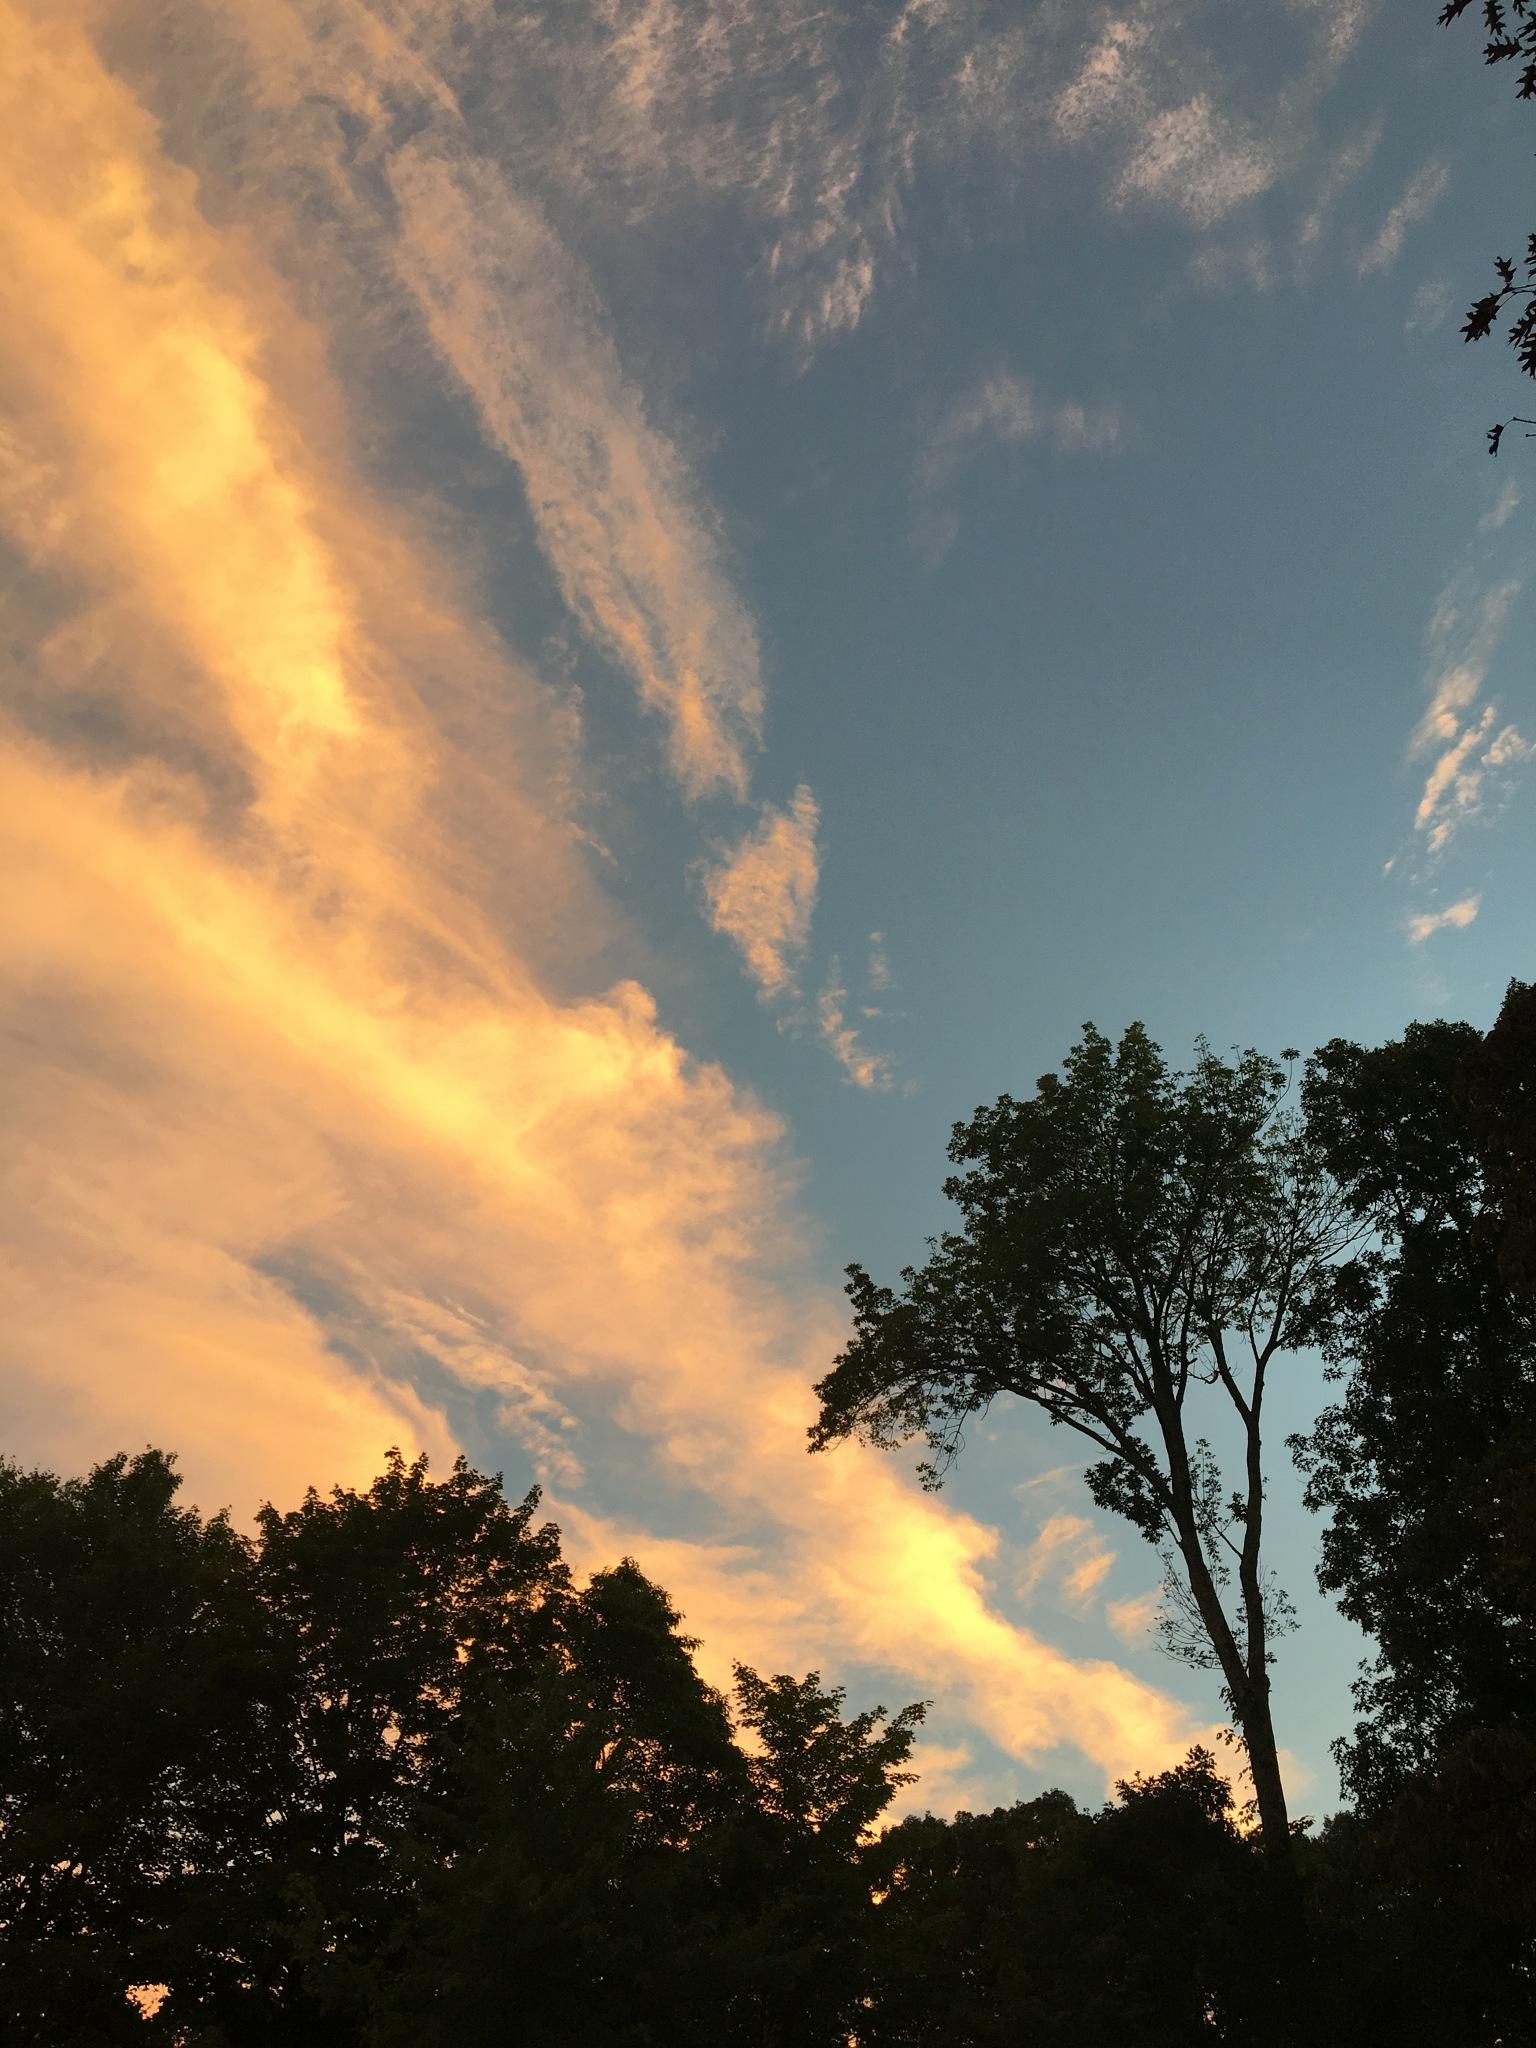 Cowboy sky by DonnaFuller